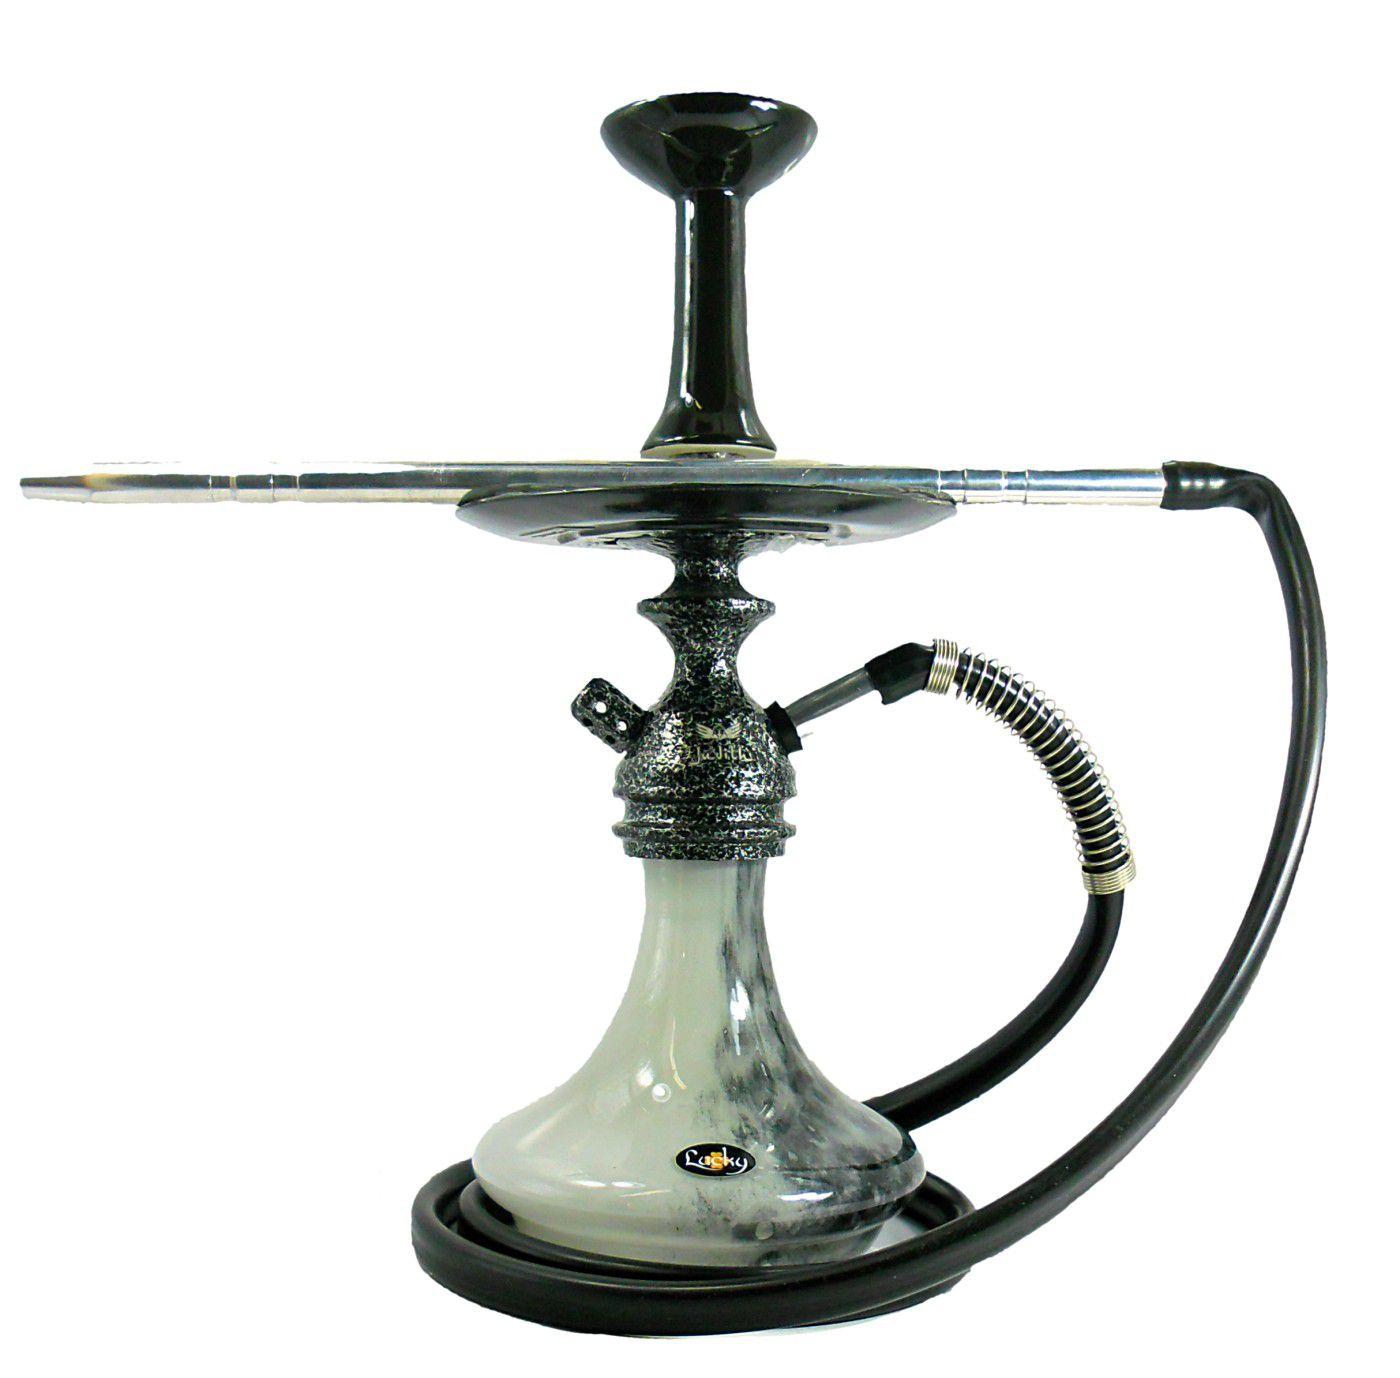 Narguile Judith PRETO martelado, vaso Aladin, mang. silicone, piteira alumínio, prato Vennus e rosh.